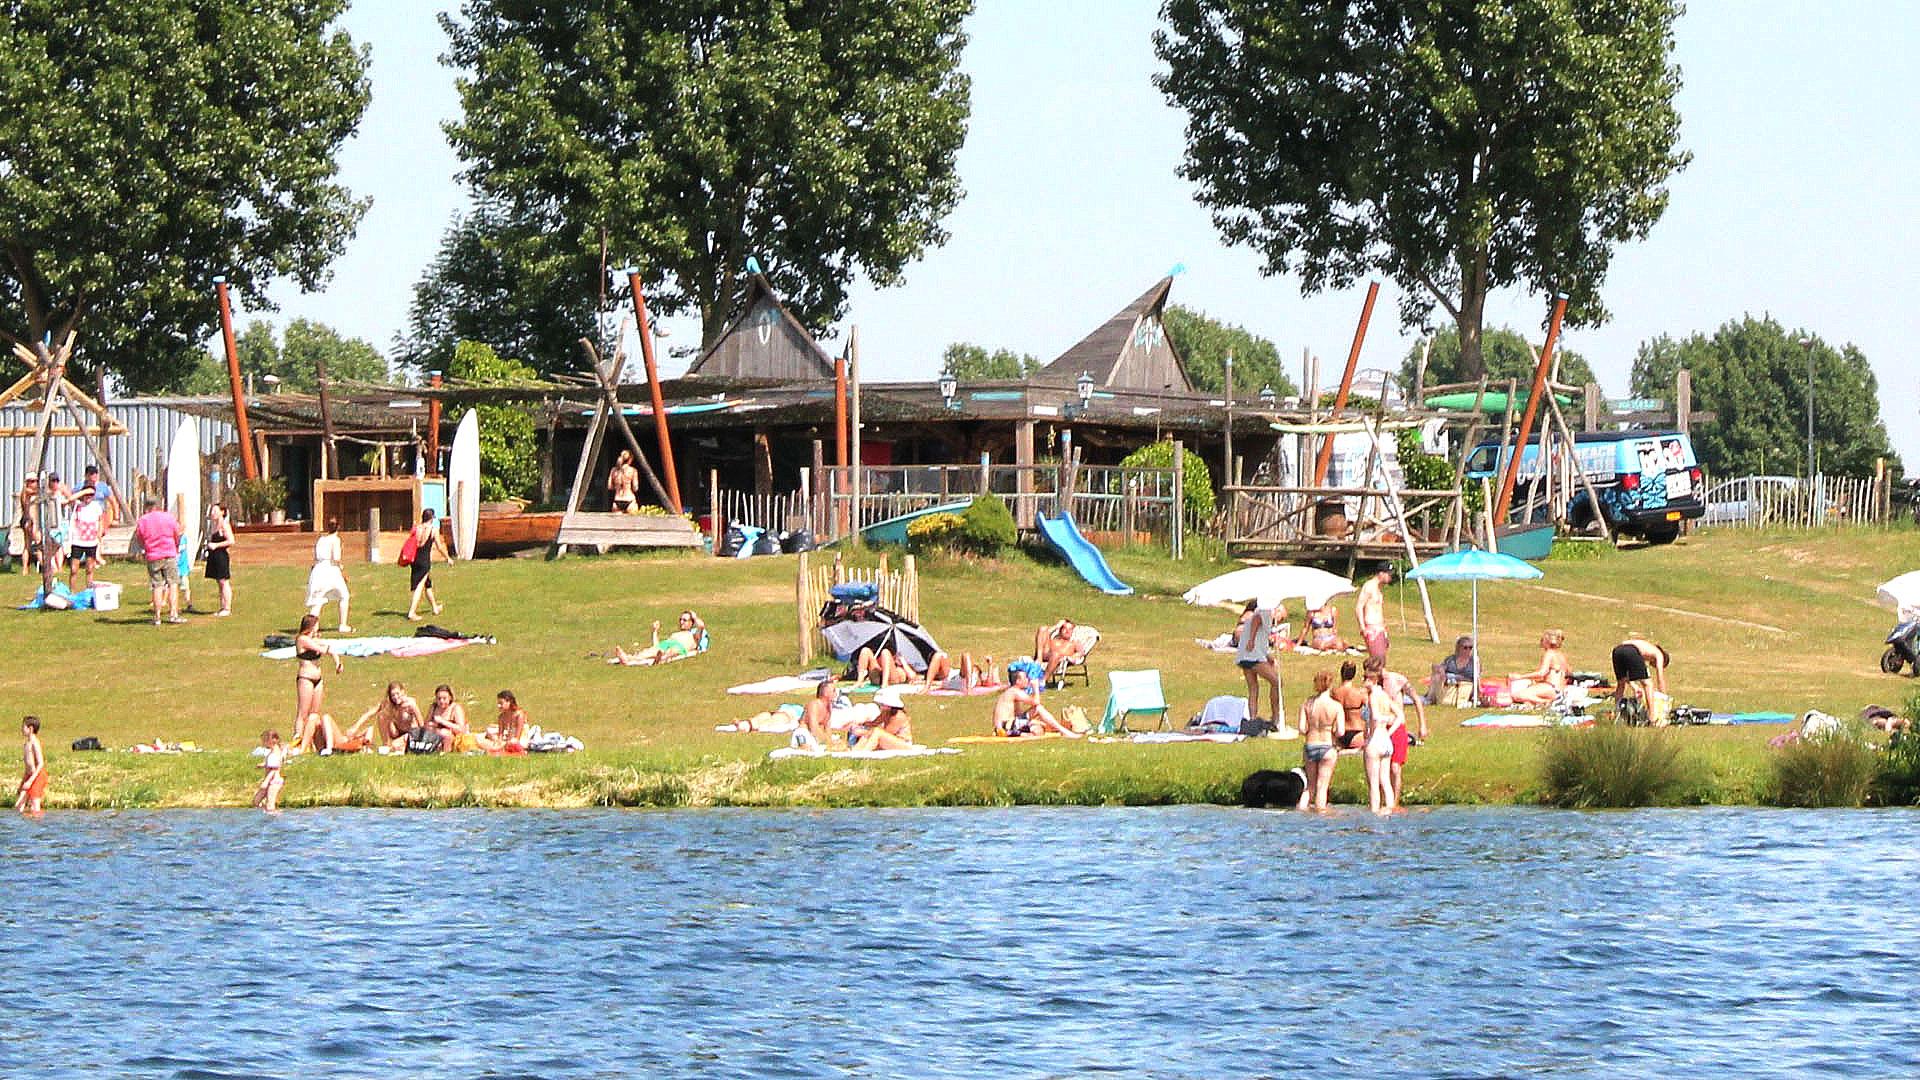 Area-X-De-Weerd-Roermond_beachclub-koers-zuid2